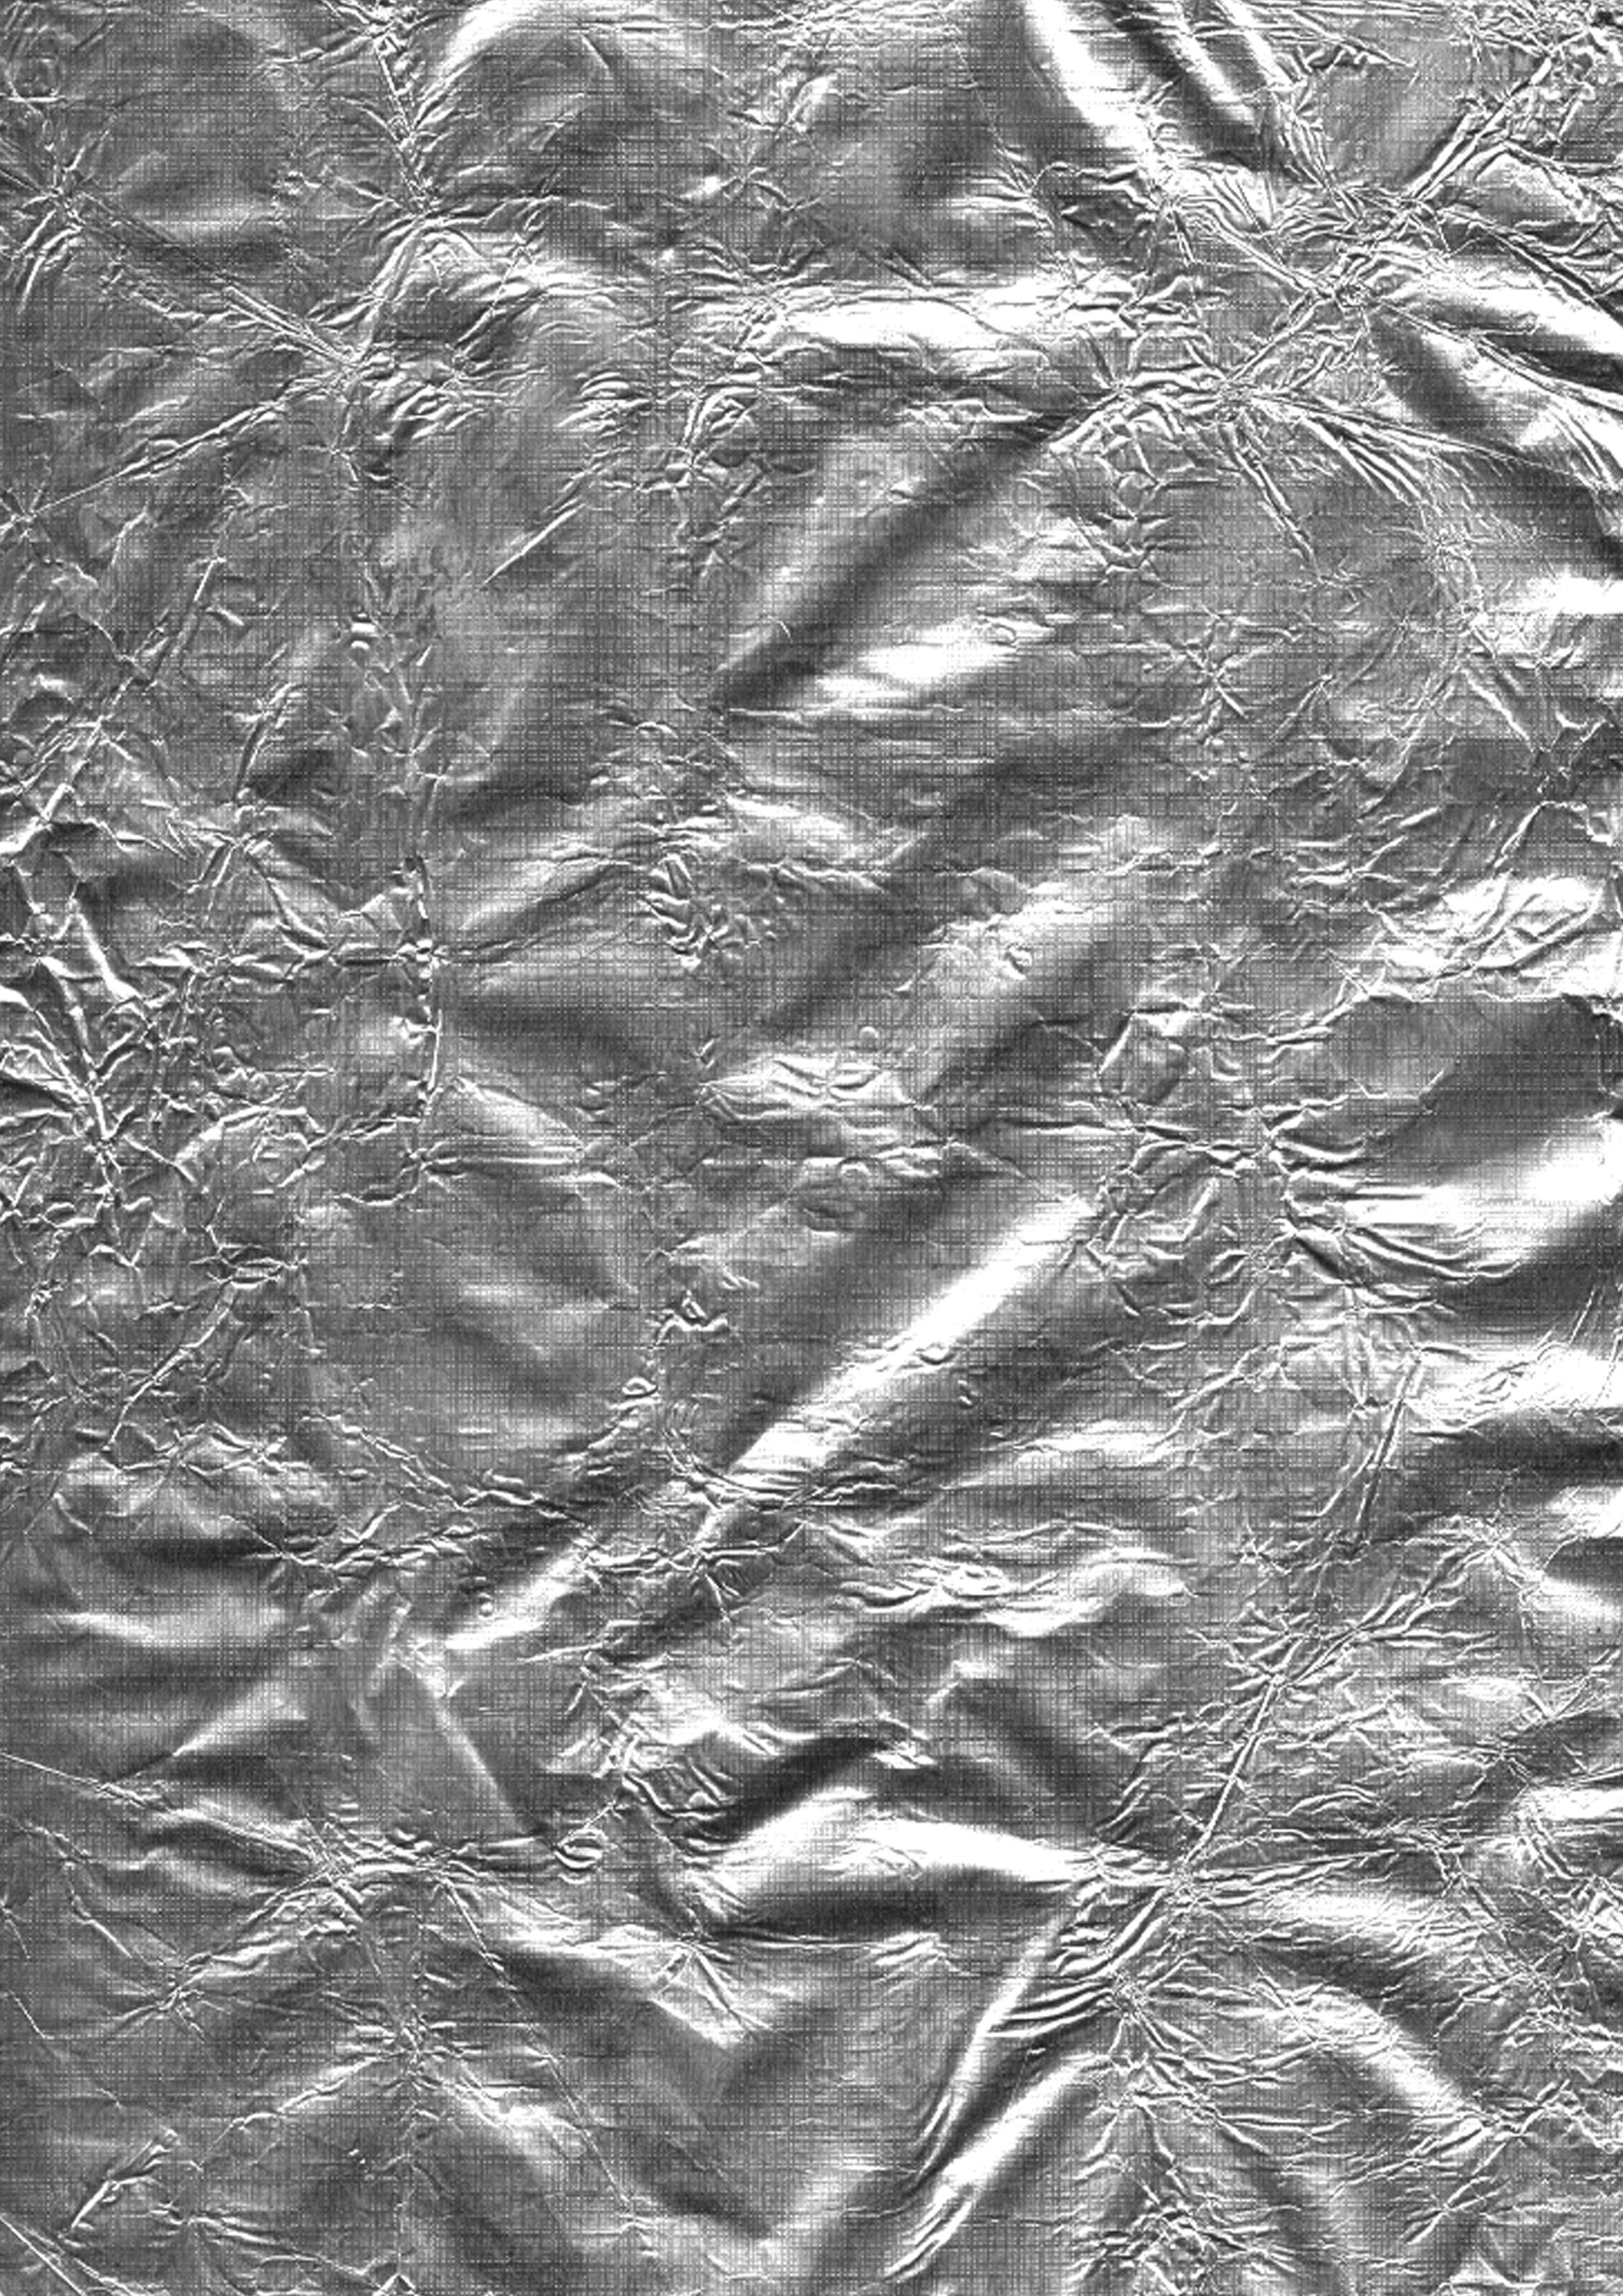 Silver Foil by PaulineMoss